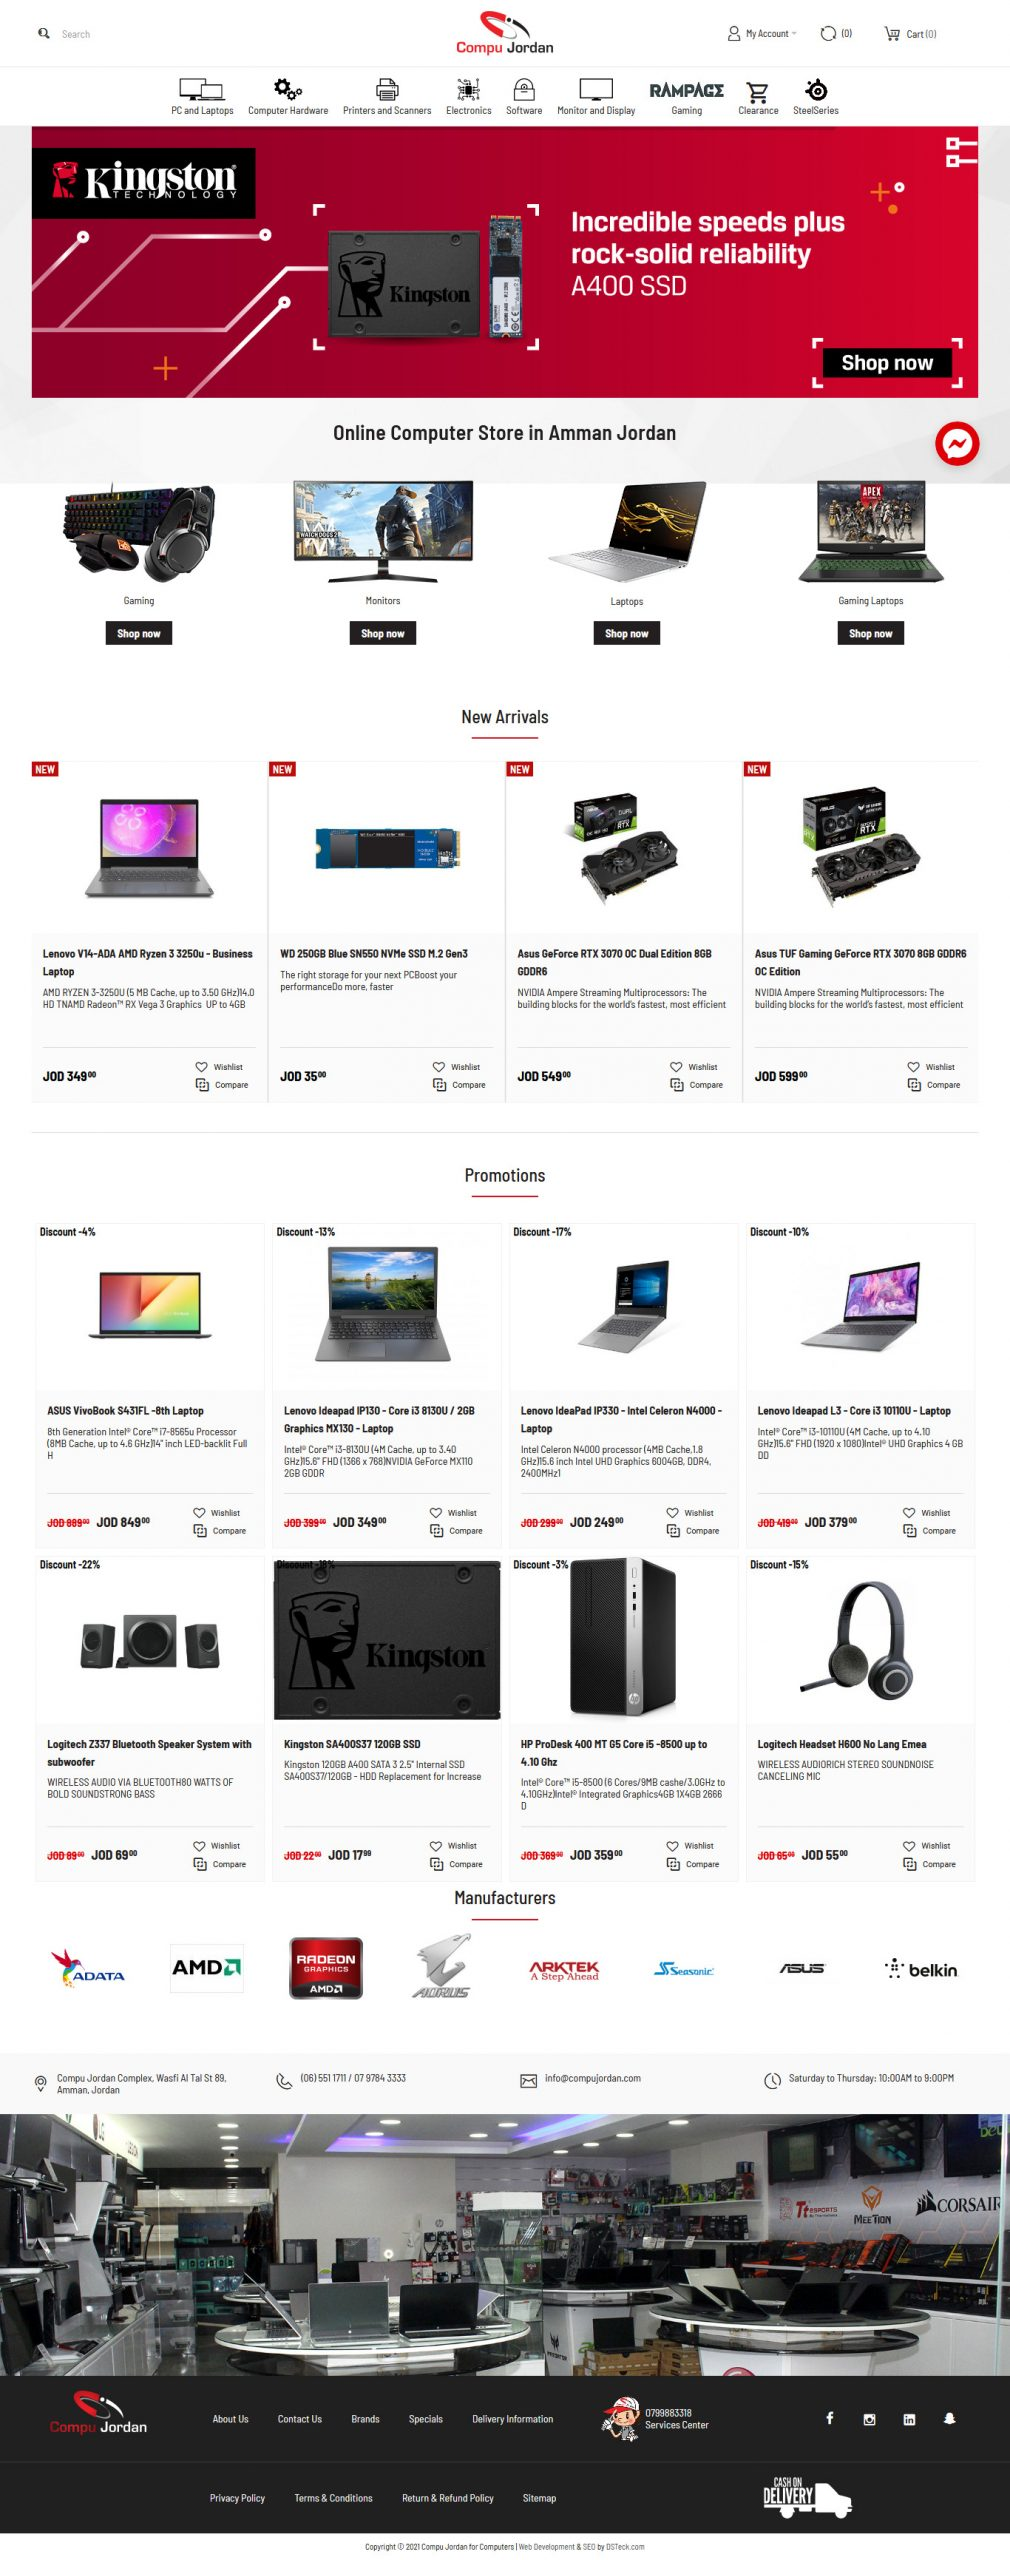 Compu Jordan Online Computer Store in Amman Jordan